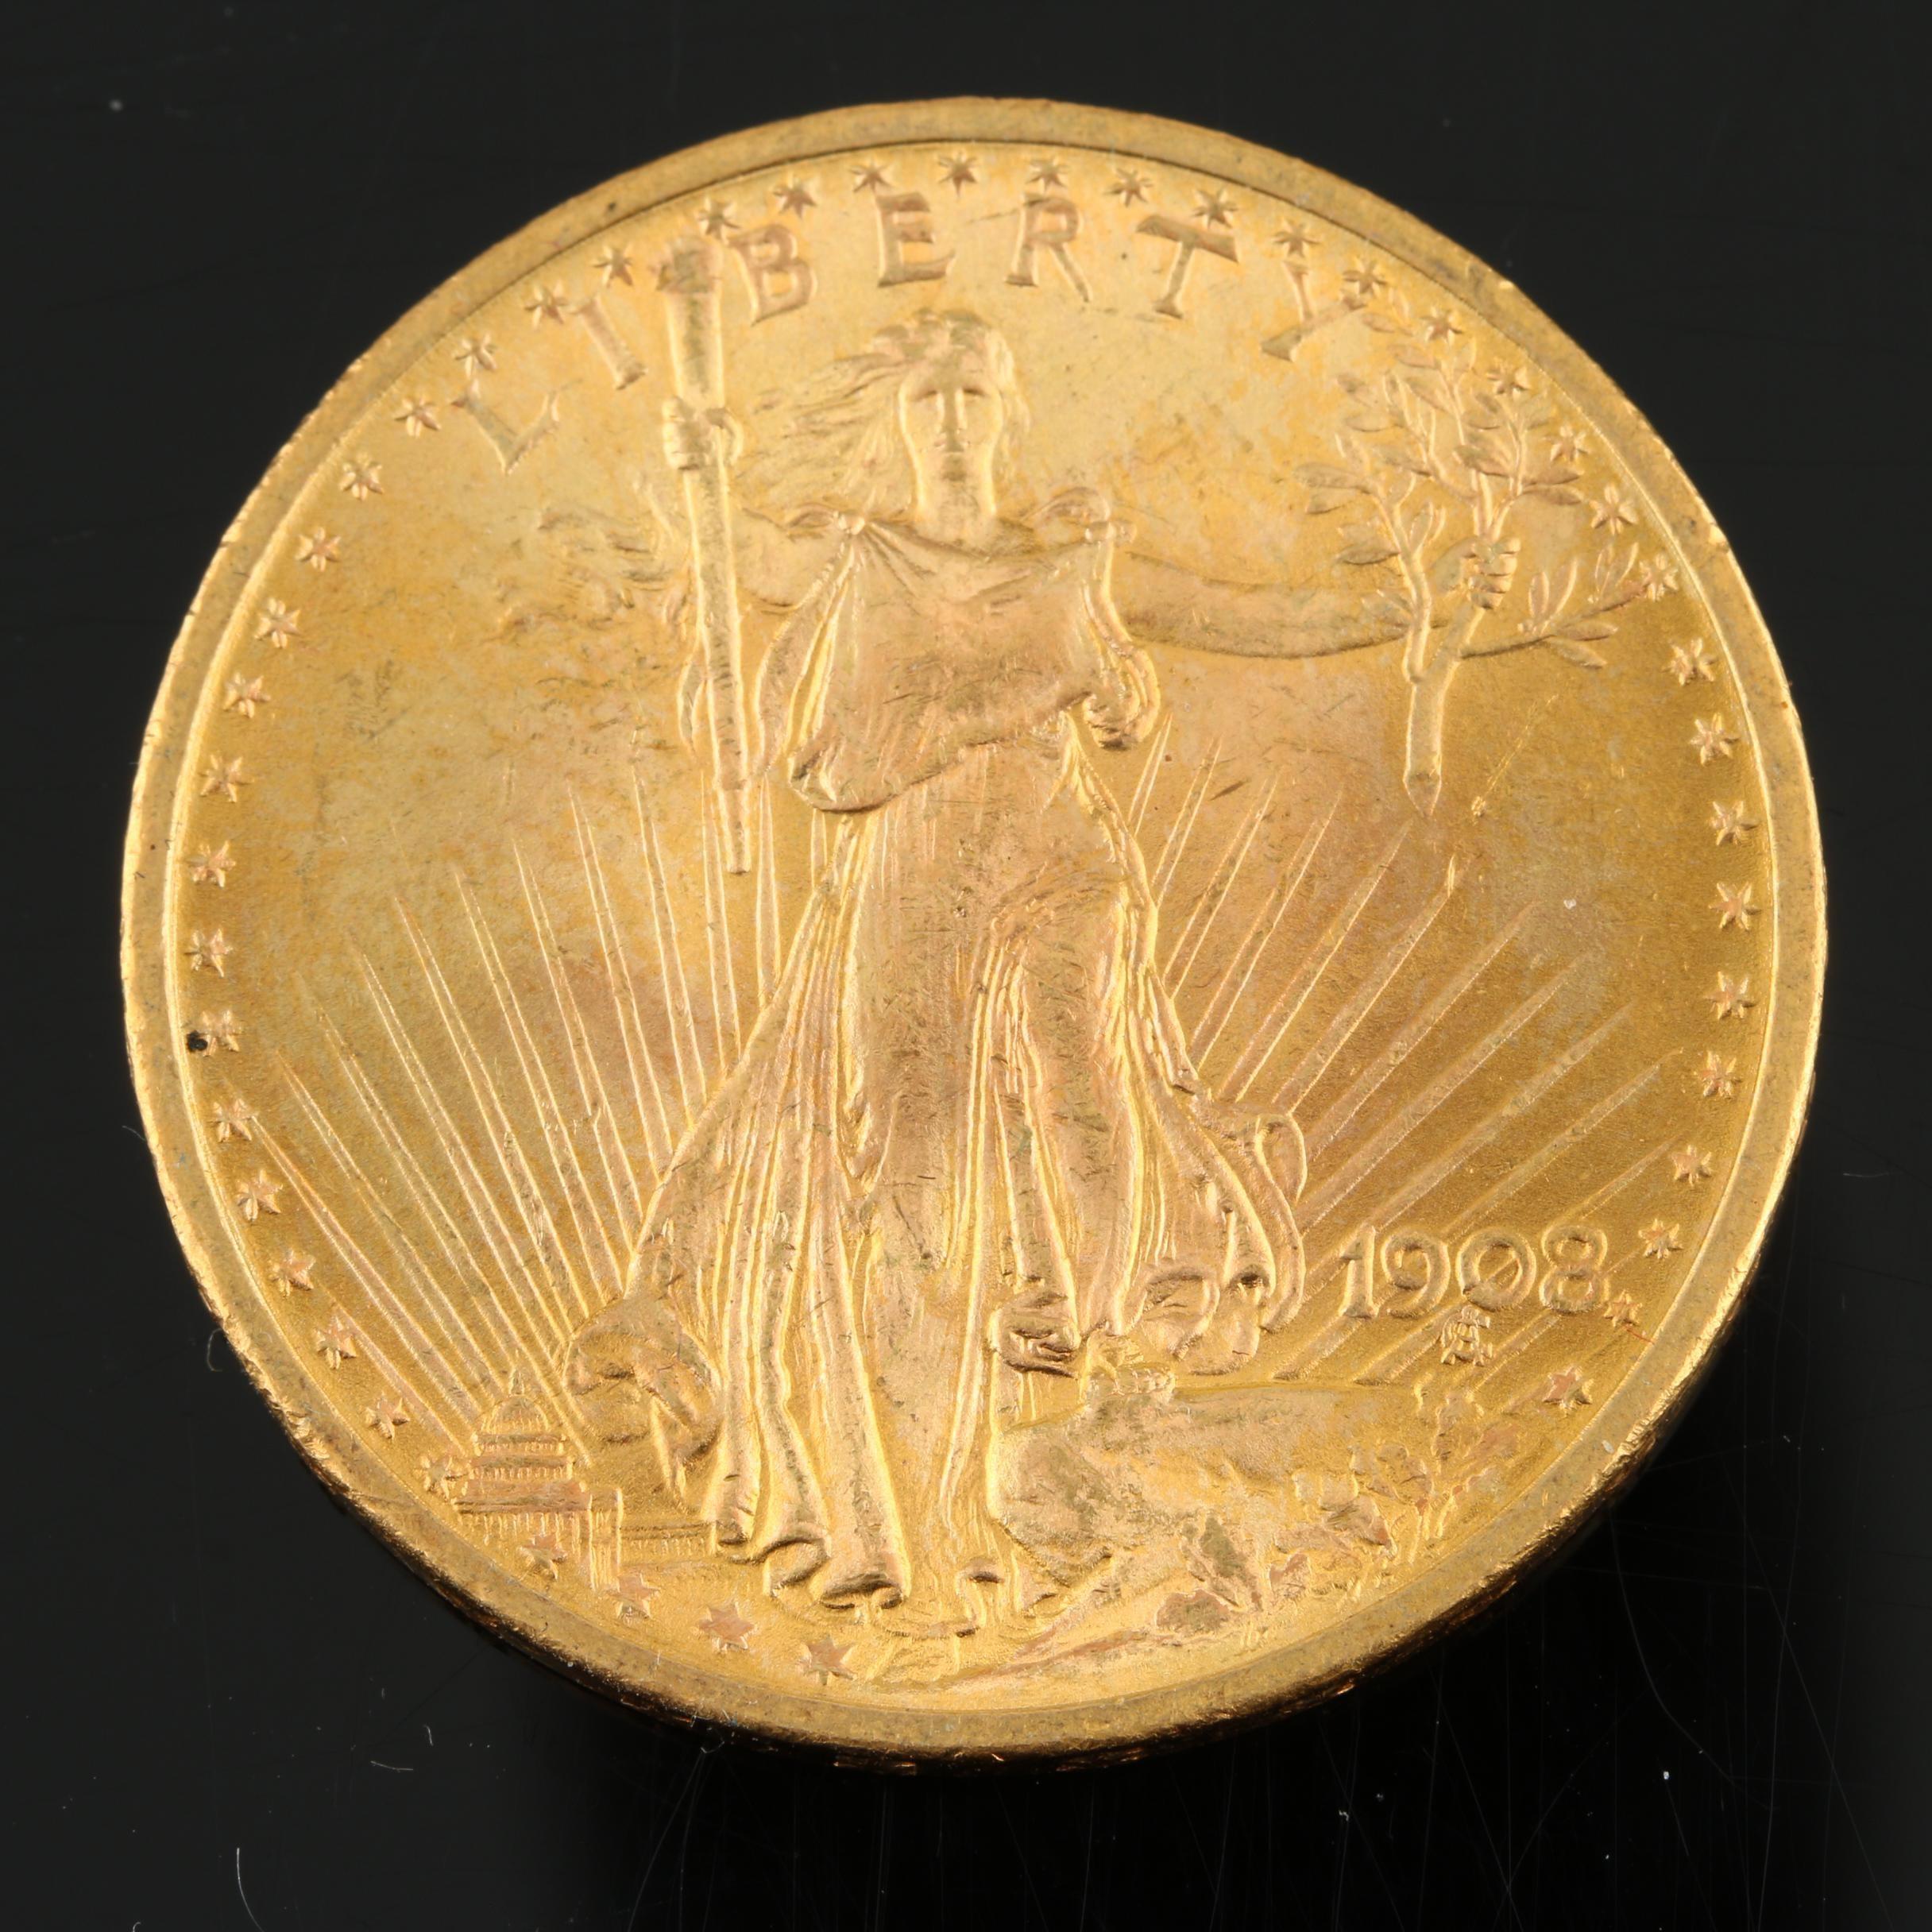 1908 Saint-Gaudens $20 Gold Double Eagle, No Motto Variety